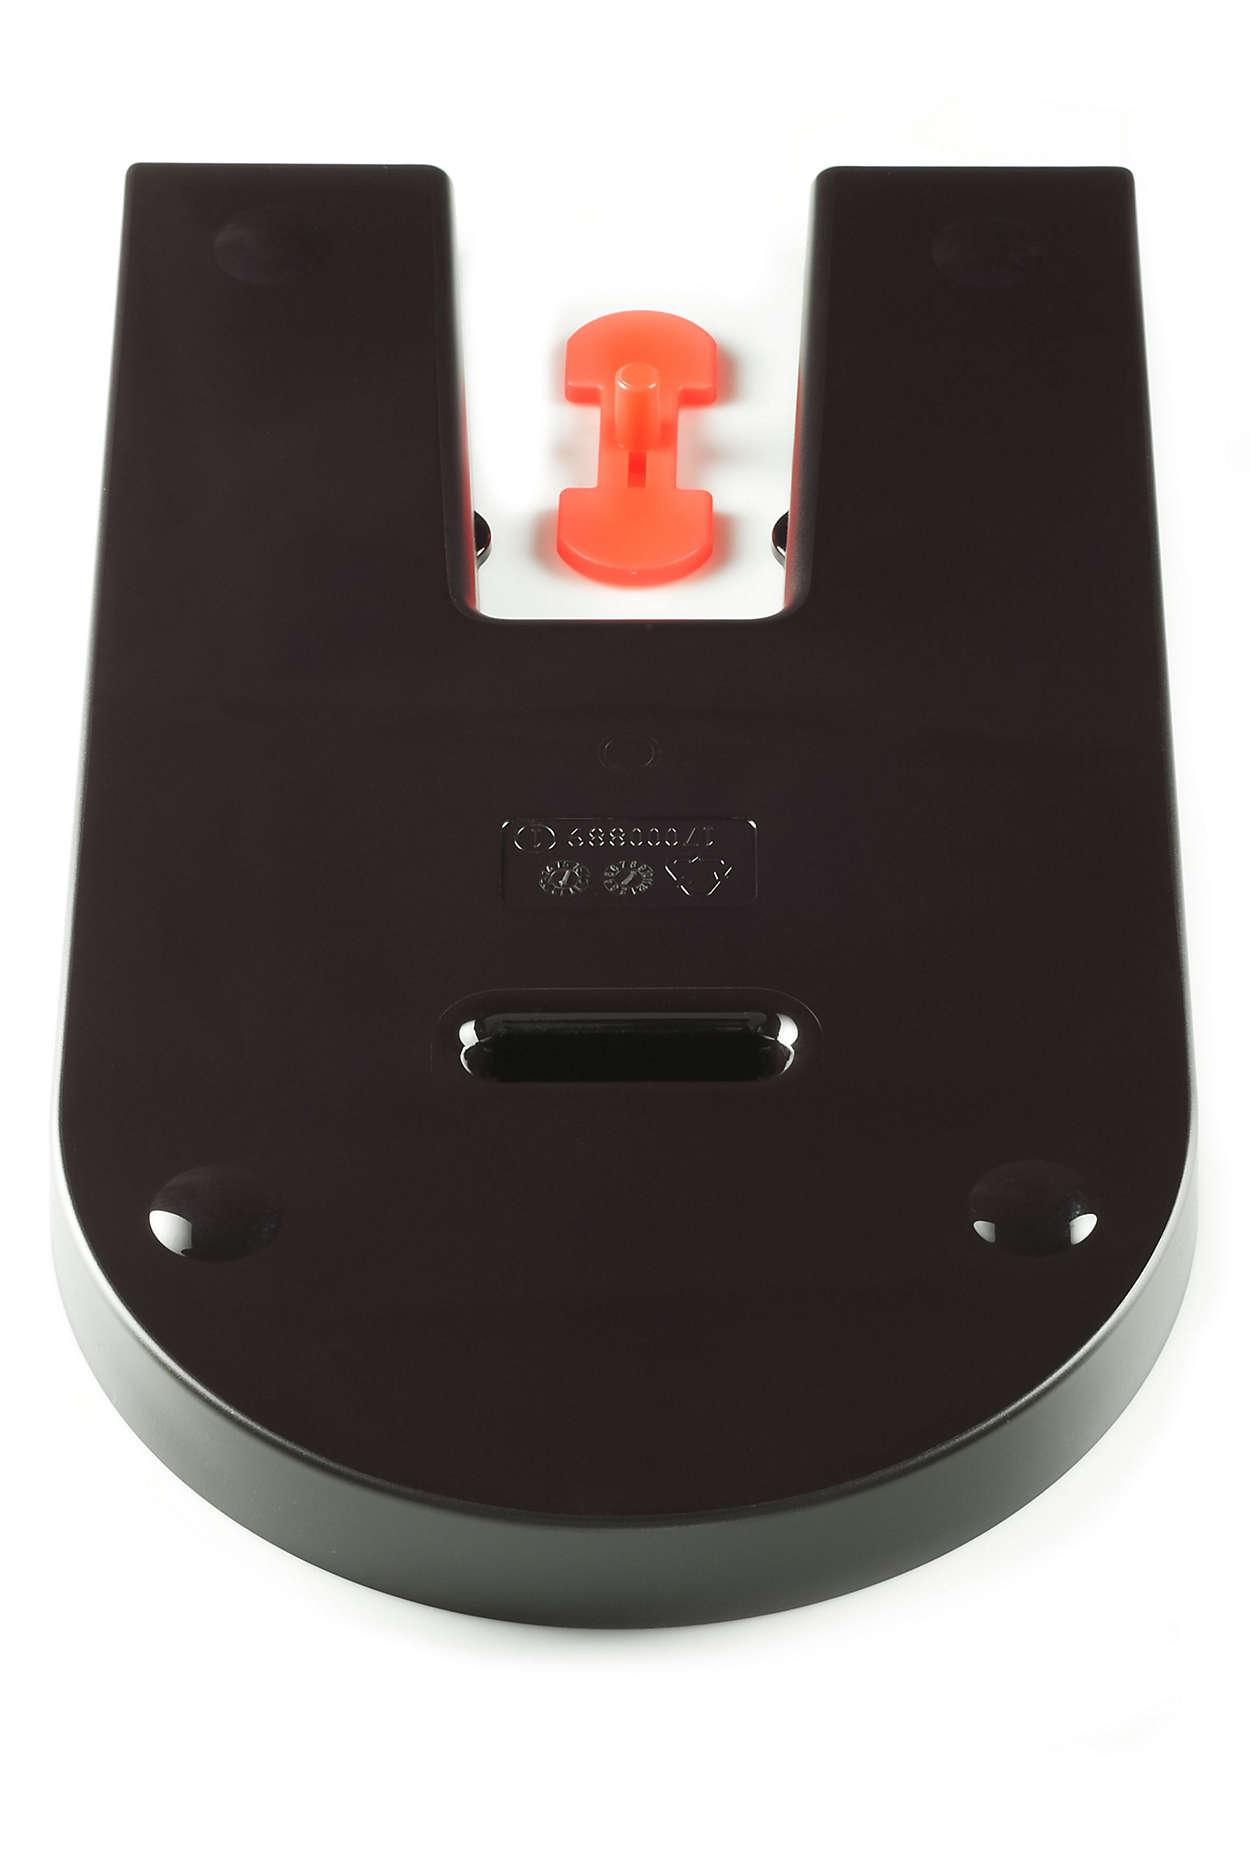 Drip tray for the SENSEO® SARISTA coffee maker